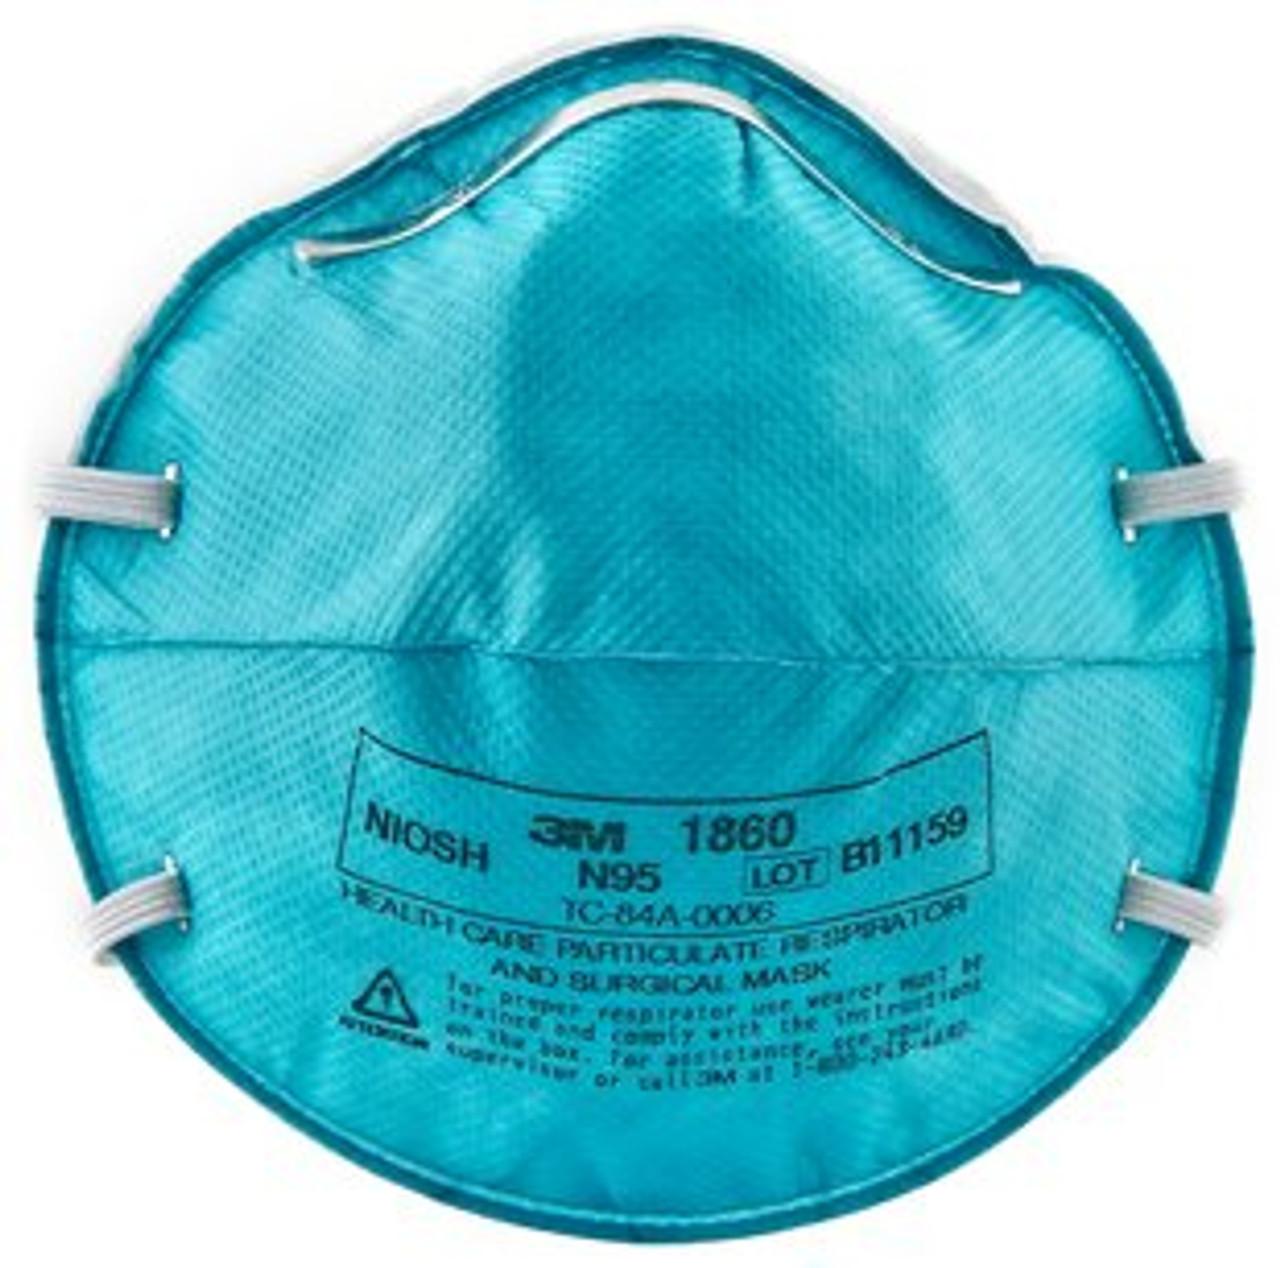 3M #1860 N95 Respirator - 20 per Box